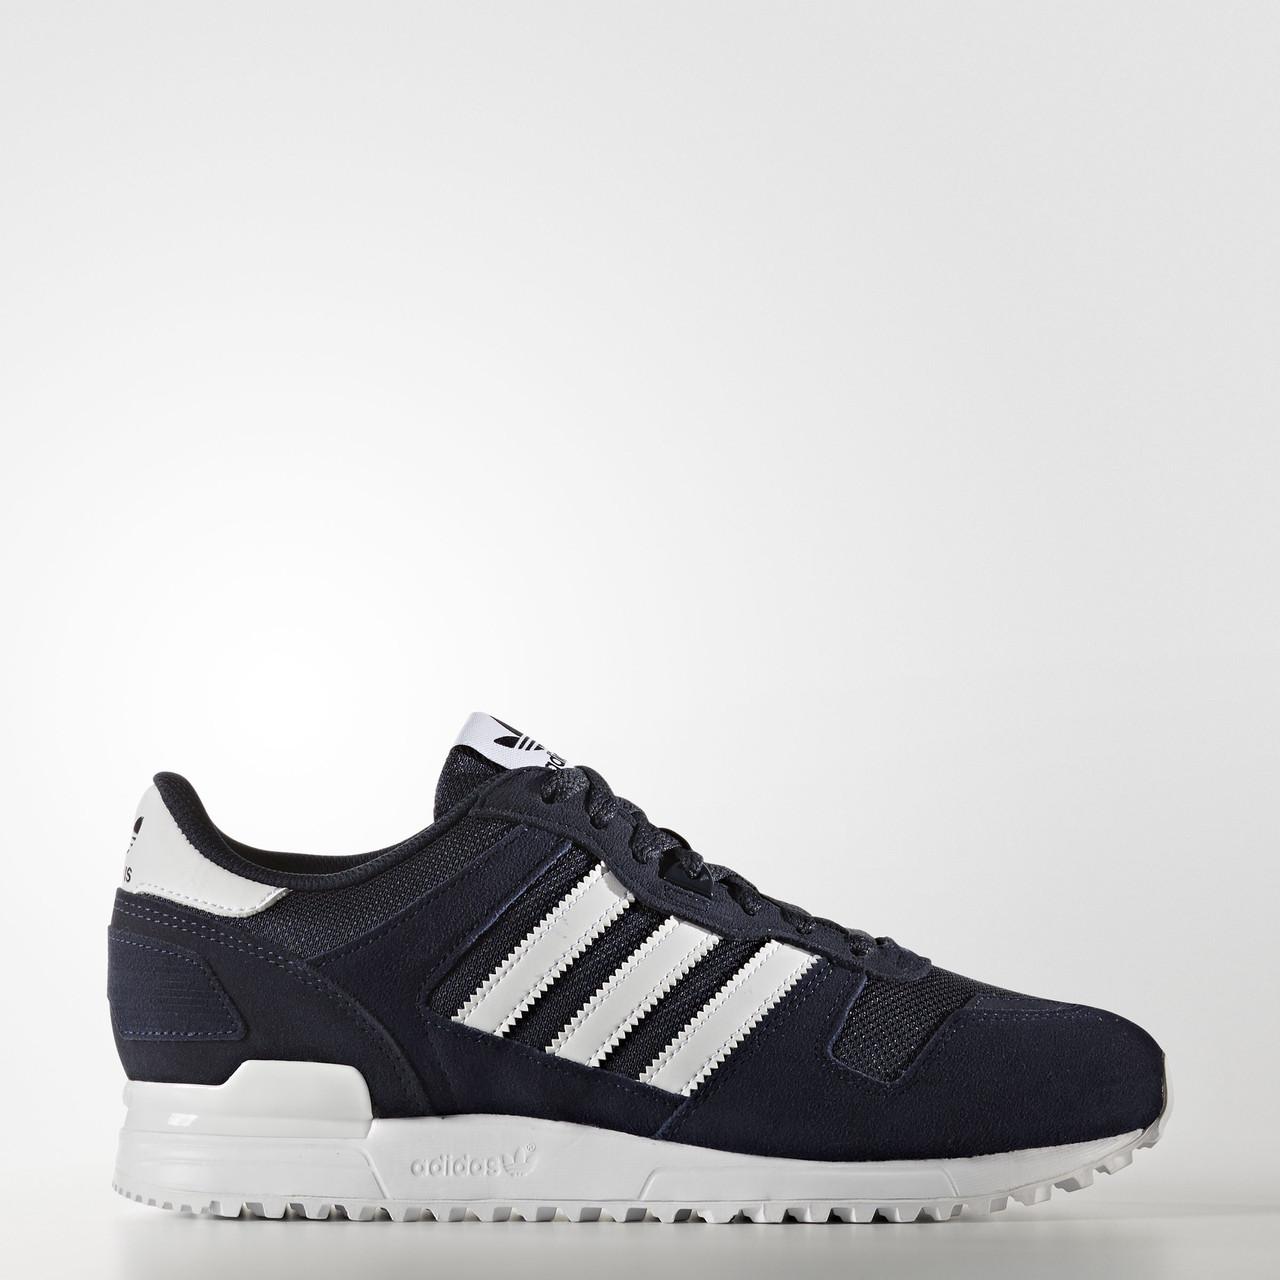 8288f9551072 Мужские Кроссовки Adidas Originals ZX 700 BB1212